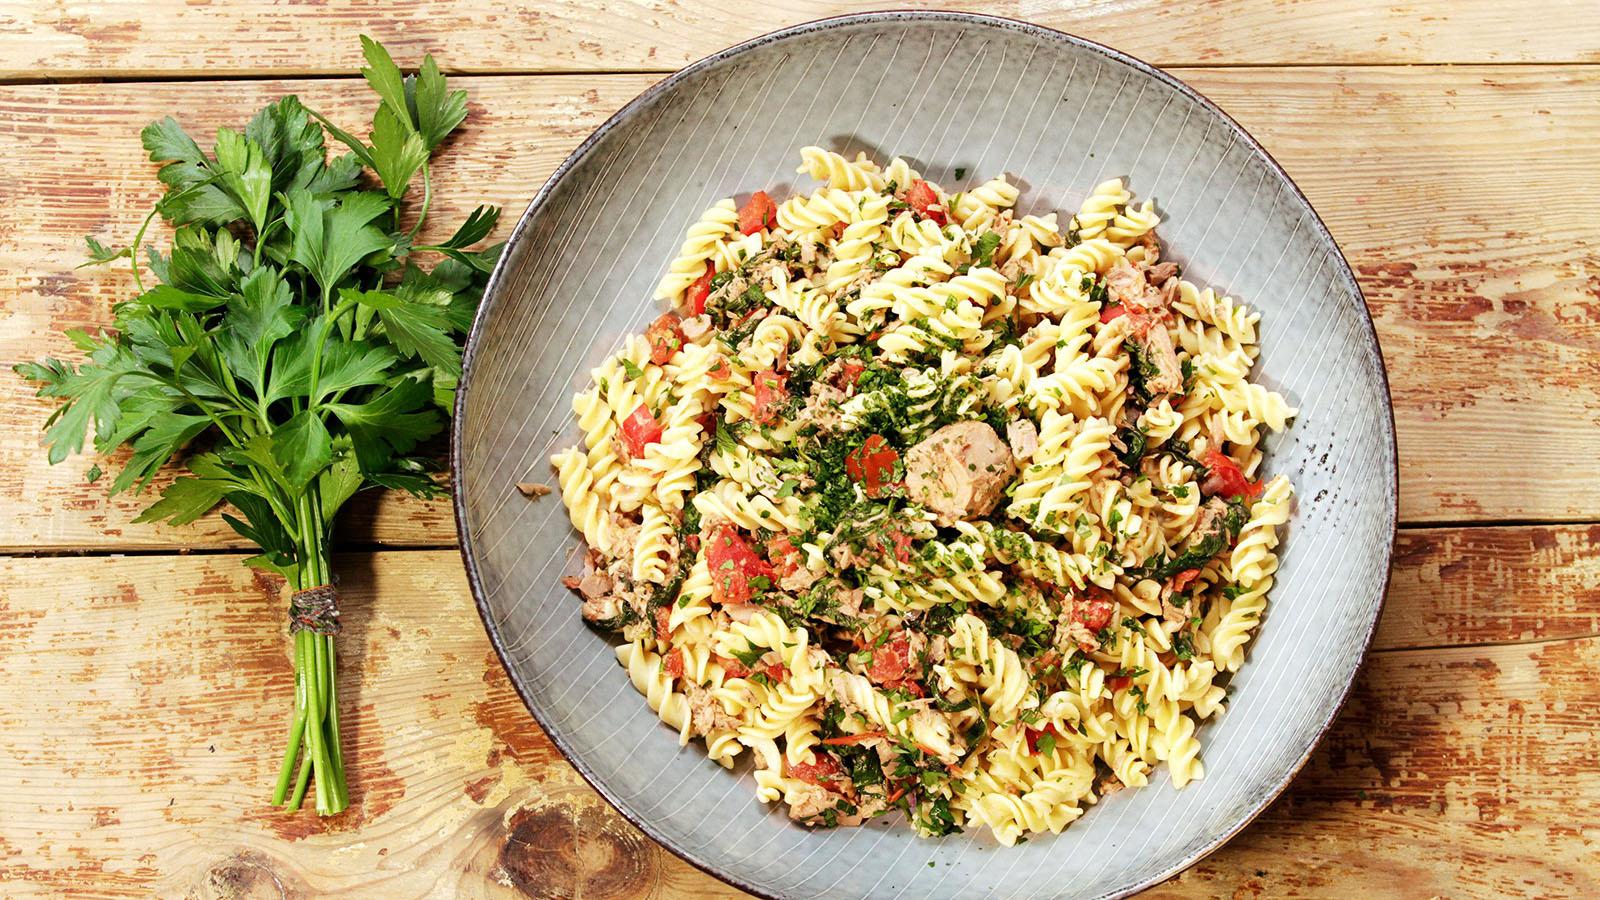 https://bezglutena-hr.schaer.com/recipes/tjestenina-s-tunom-i-rajcicom